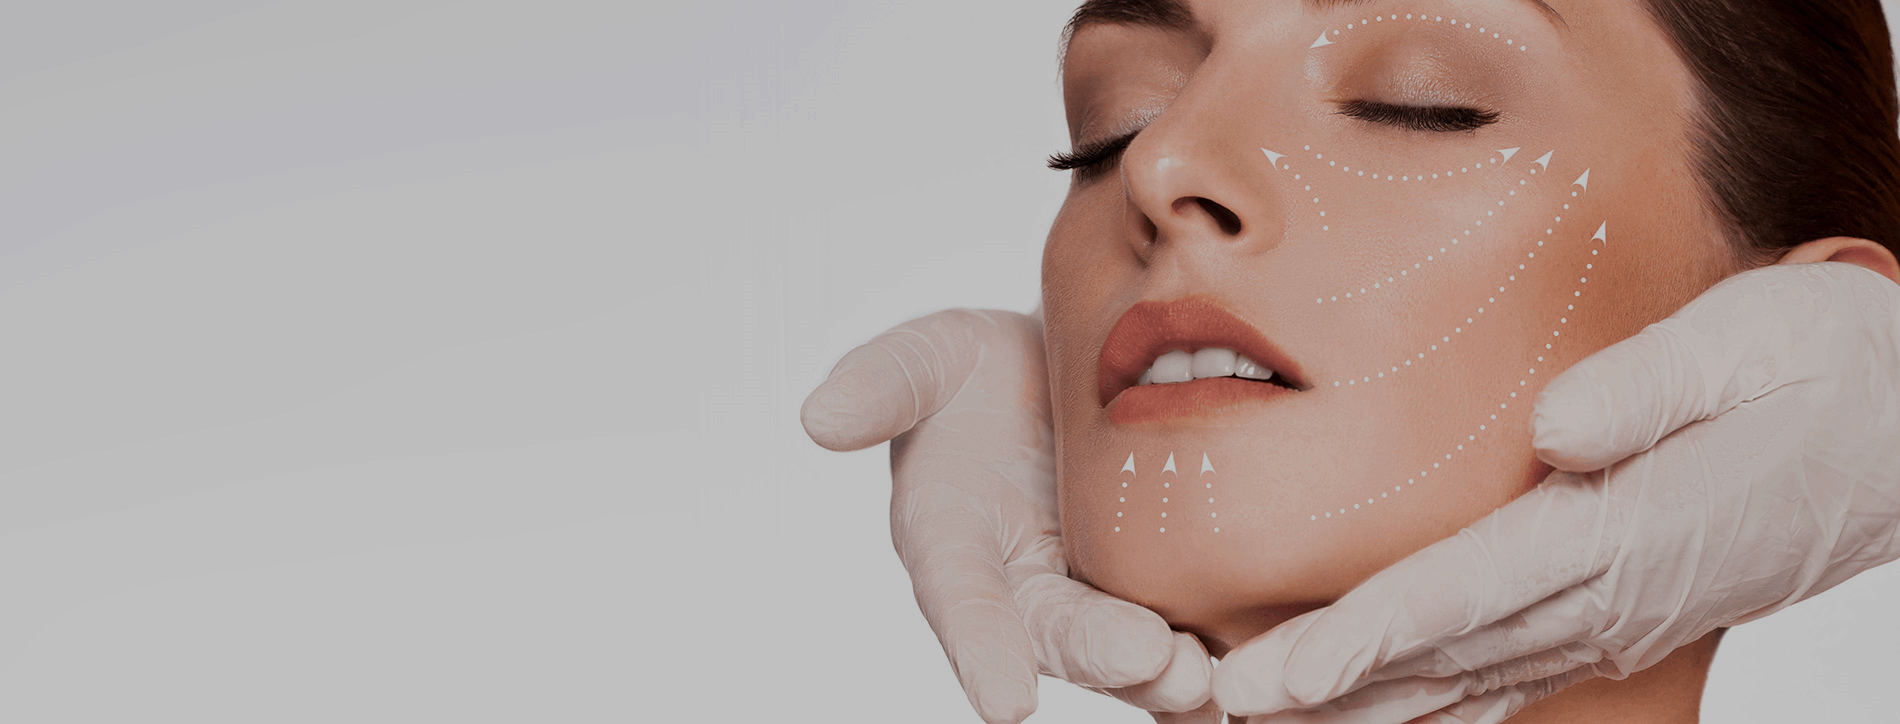 Botox and Juvederm Treatment